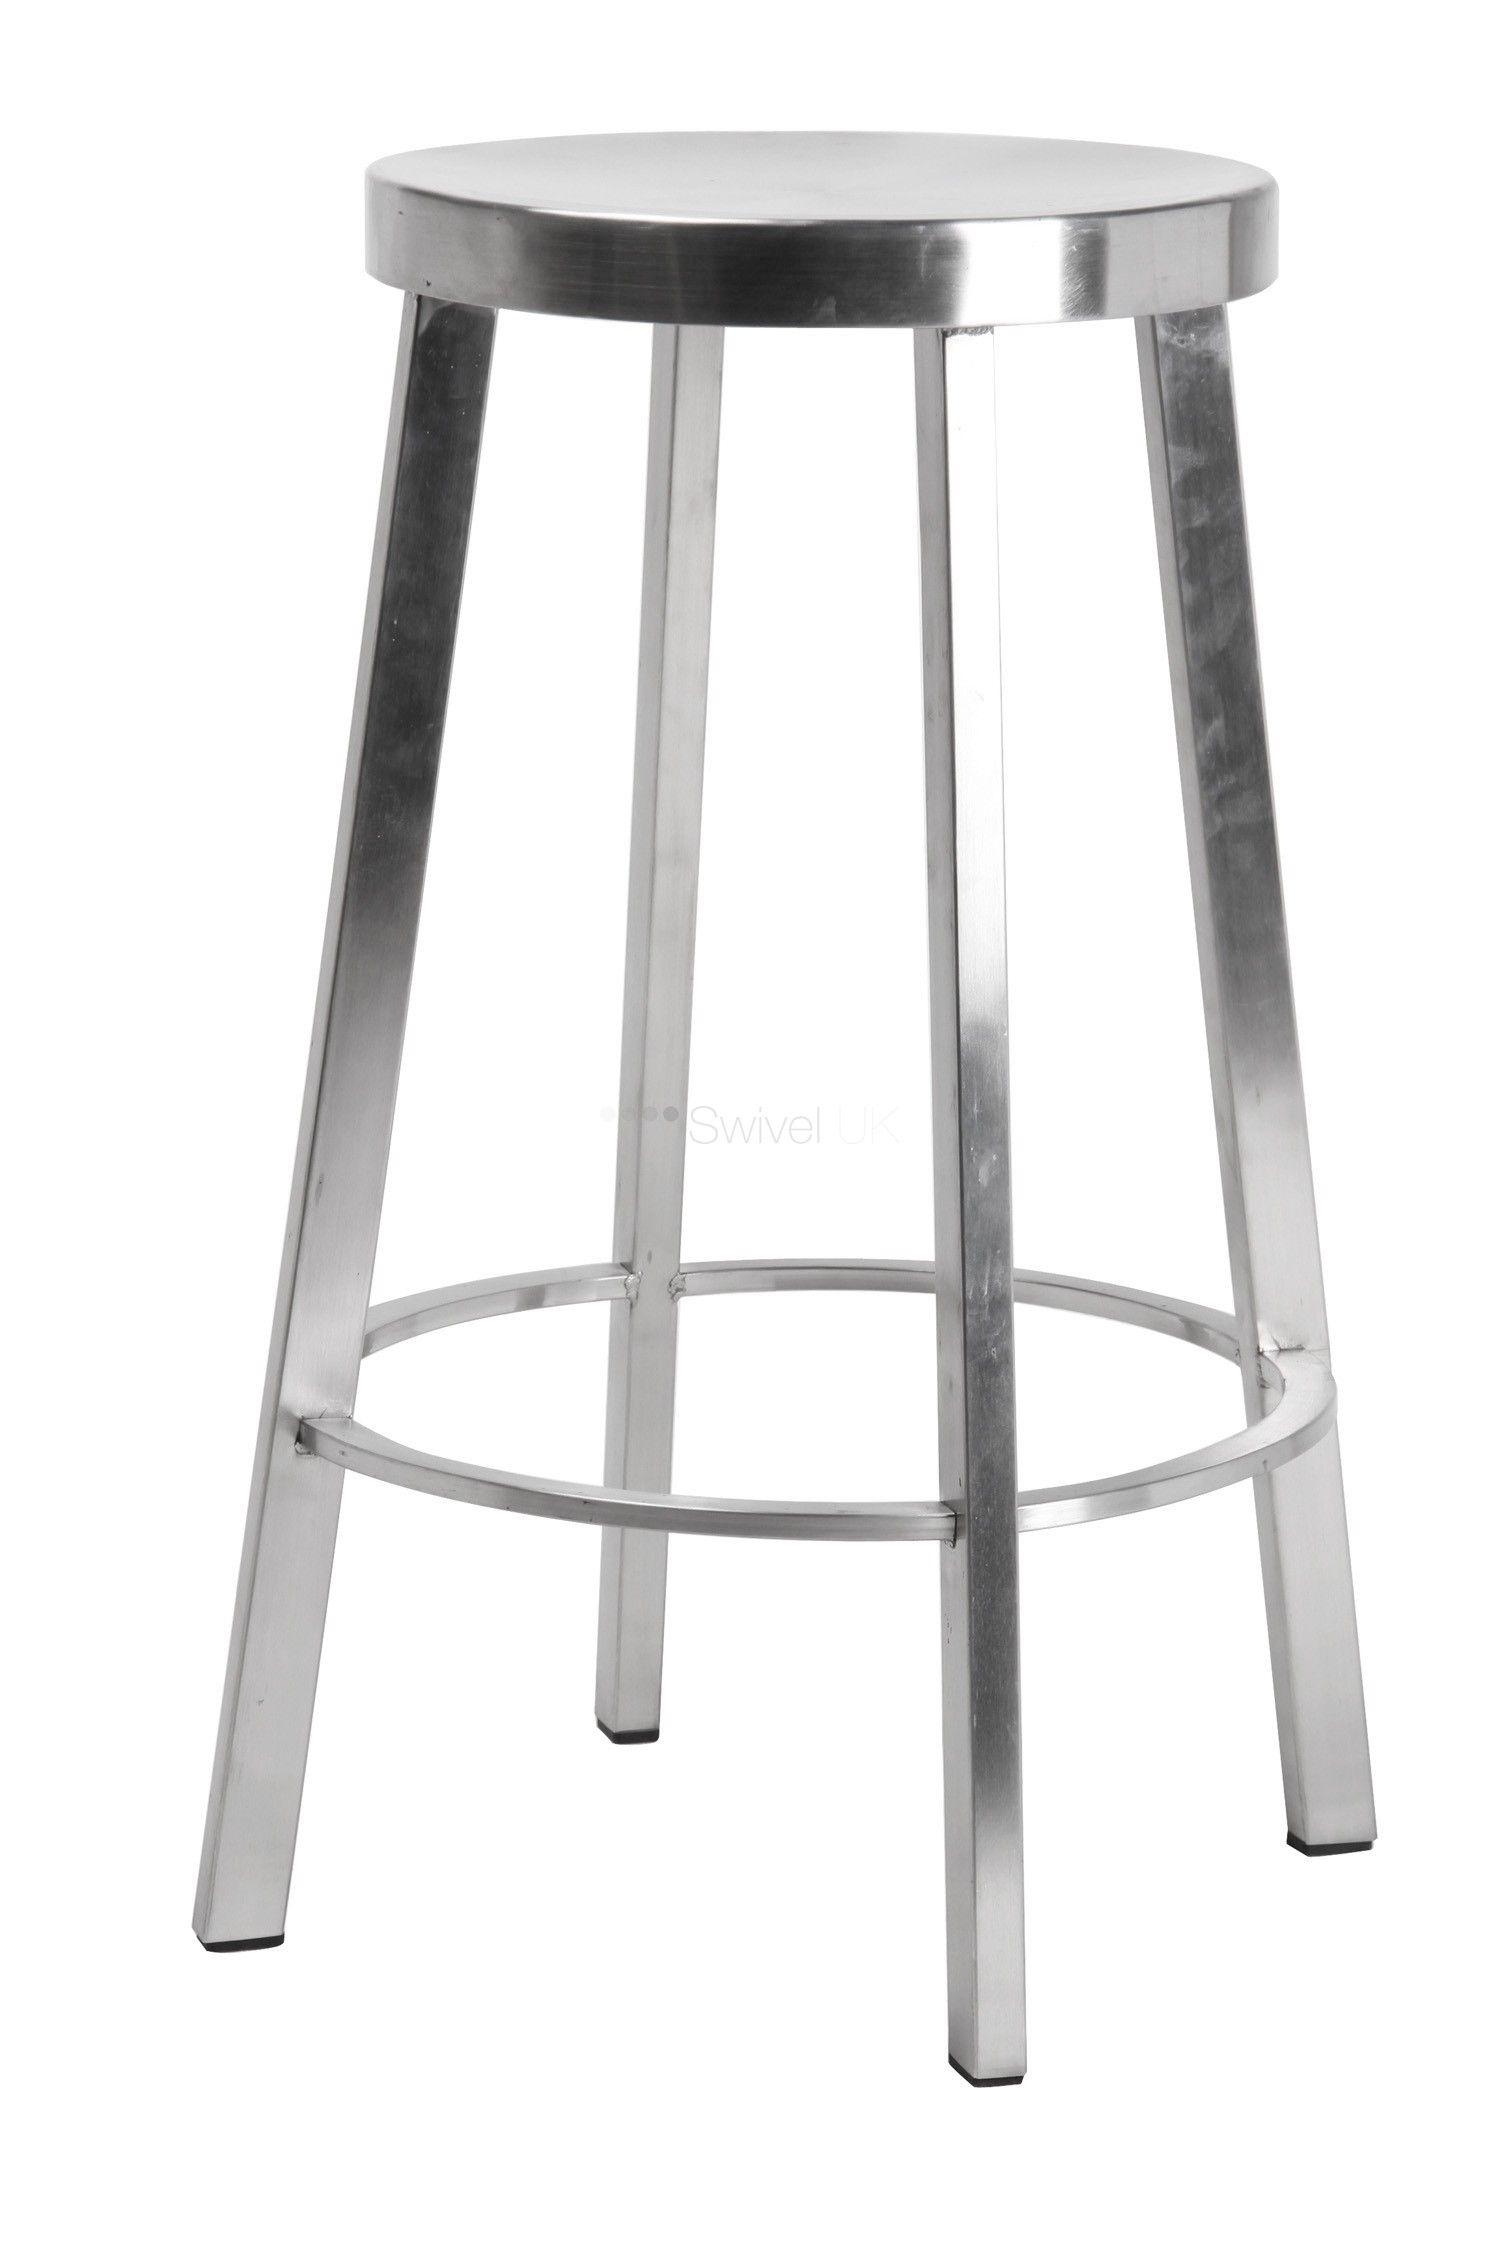 Admirable Deja Vu Round Bar Stool Naoto Fukasawa 215 Stool Machost Co Dining Chair Design Ideas Machostcouk